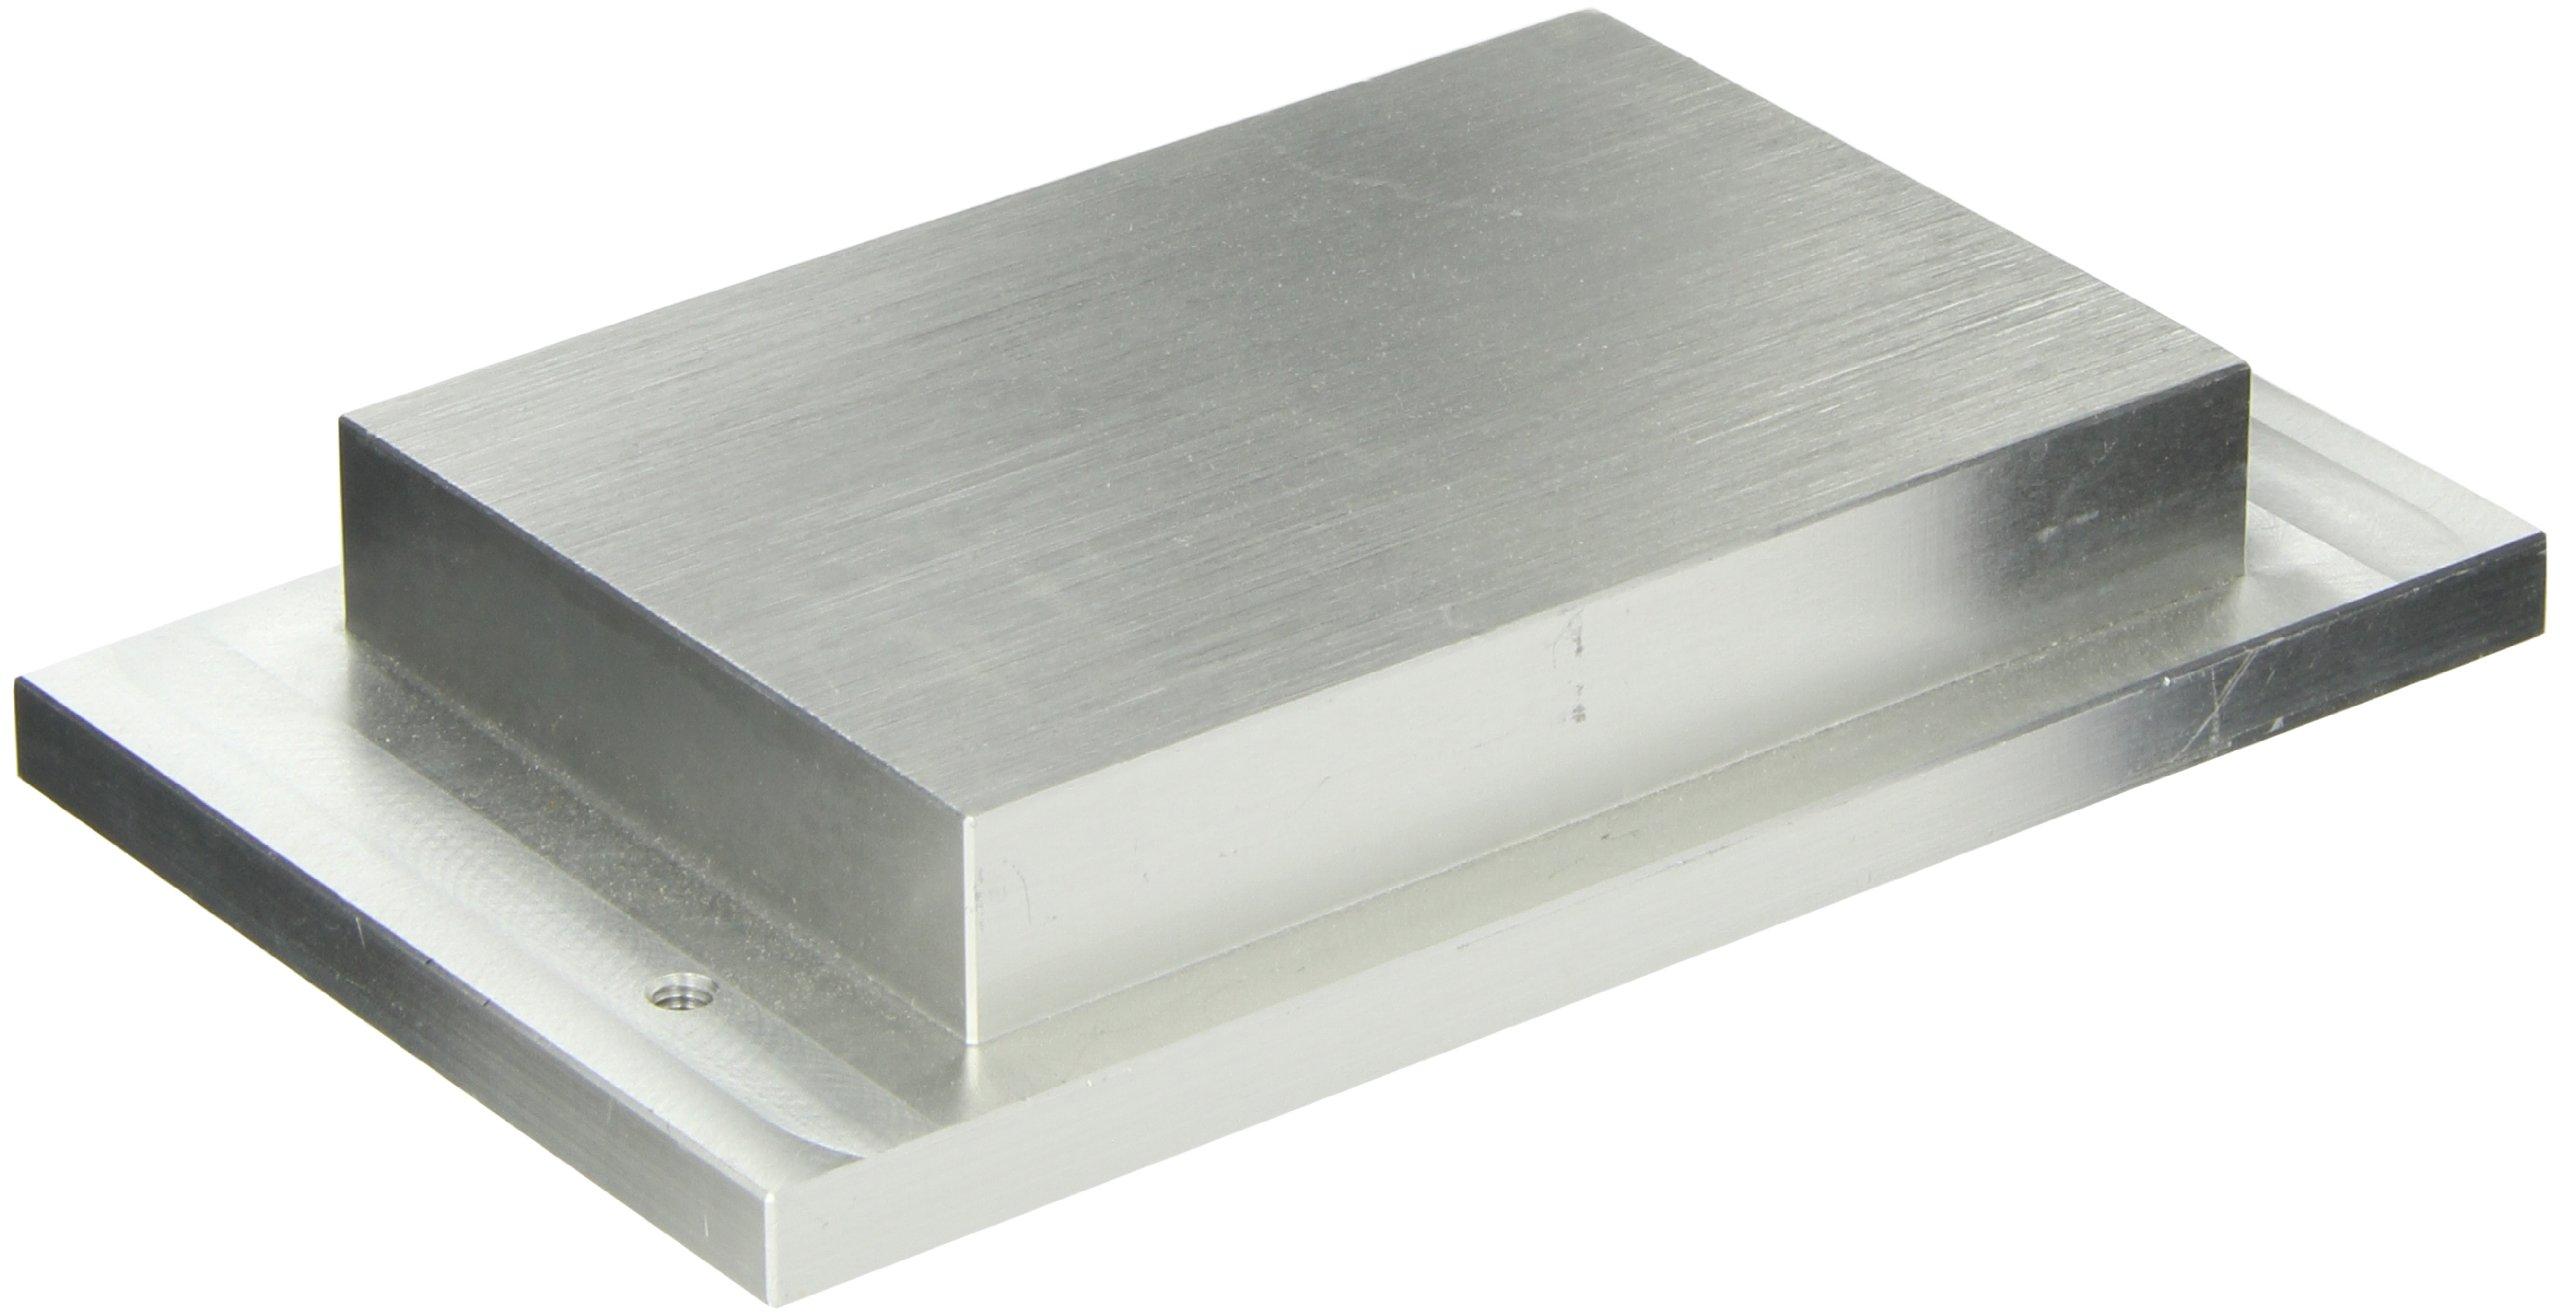 Labnet D1296 Aluminum Dry Bath Dual Block, Holds 96 Well Microtiter Plate/ 4 Slides